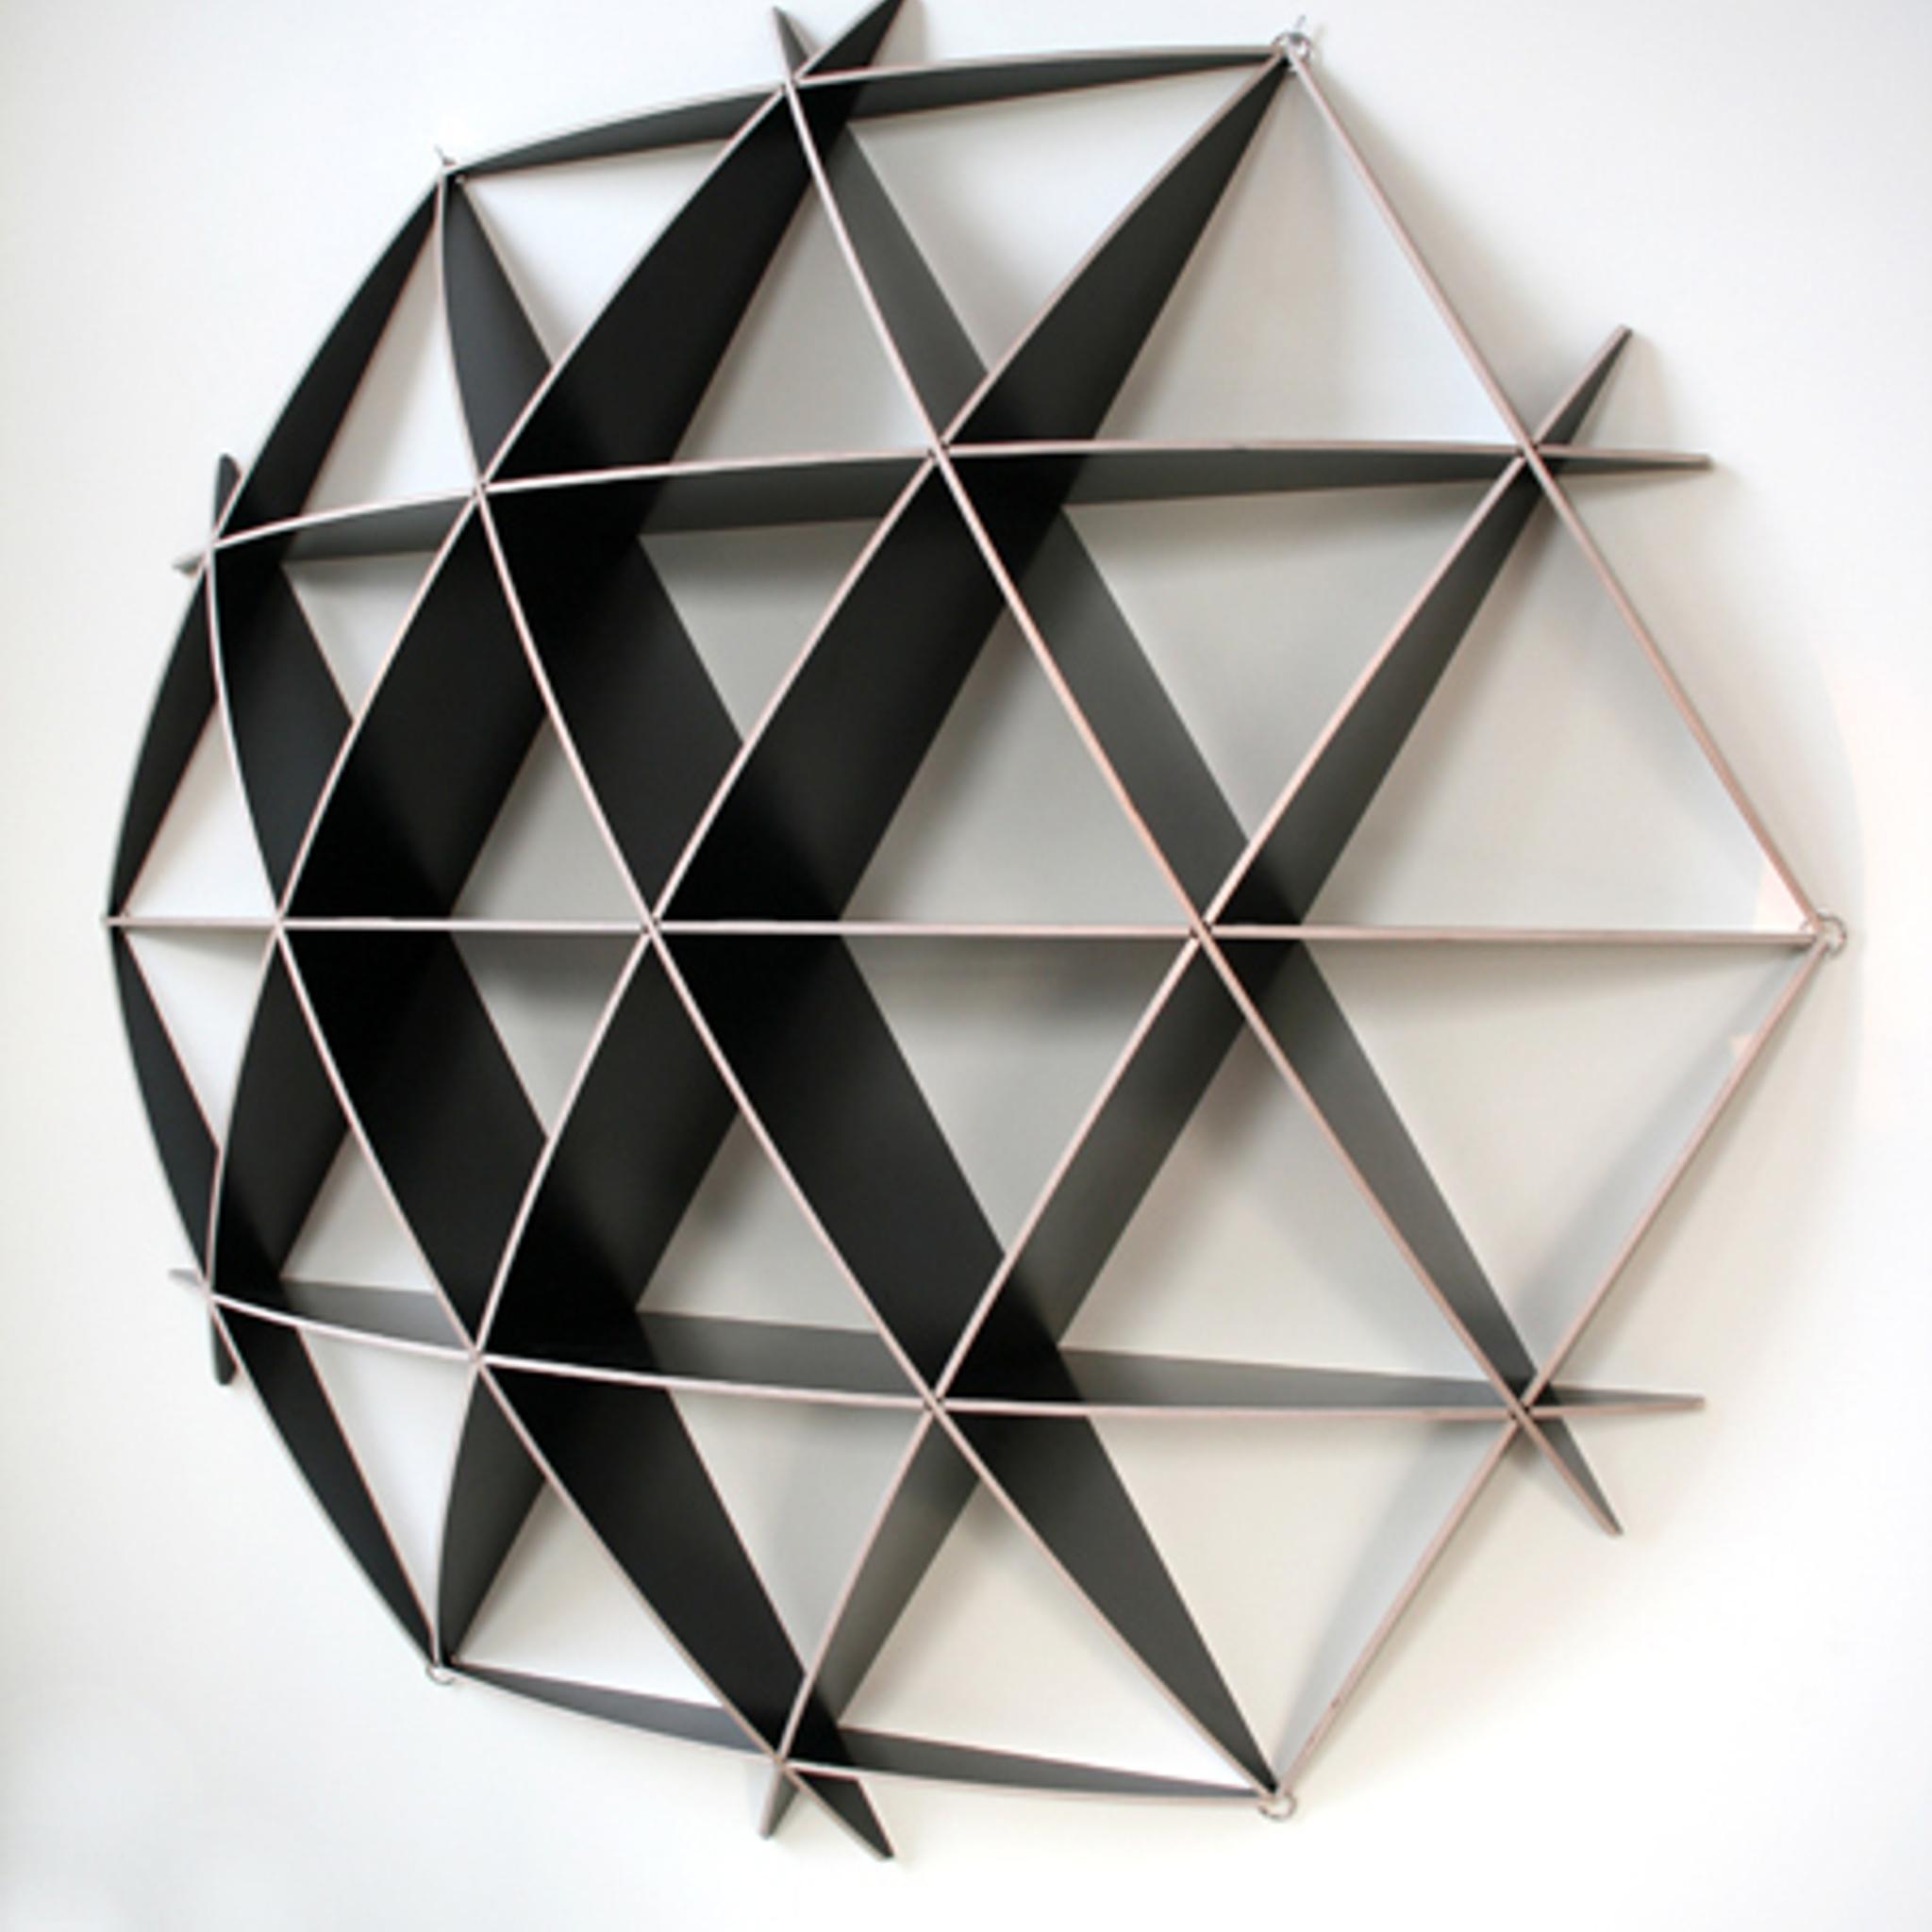 rundes wandregal in schwarz nordisches design. Black Bedroom Furniture Sets. Home Design Ideas